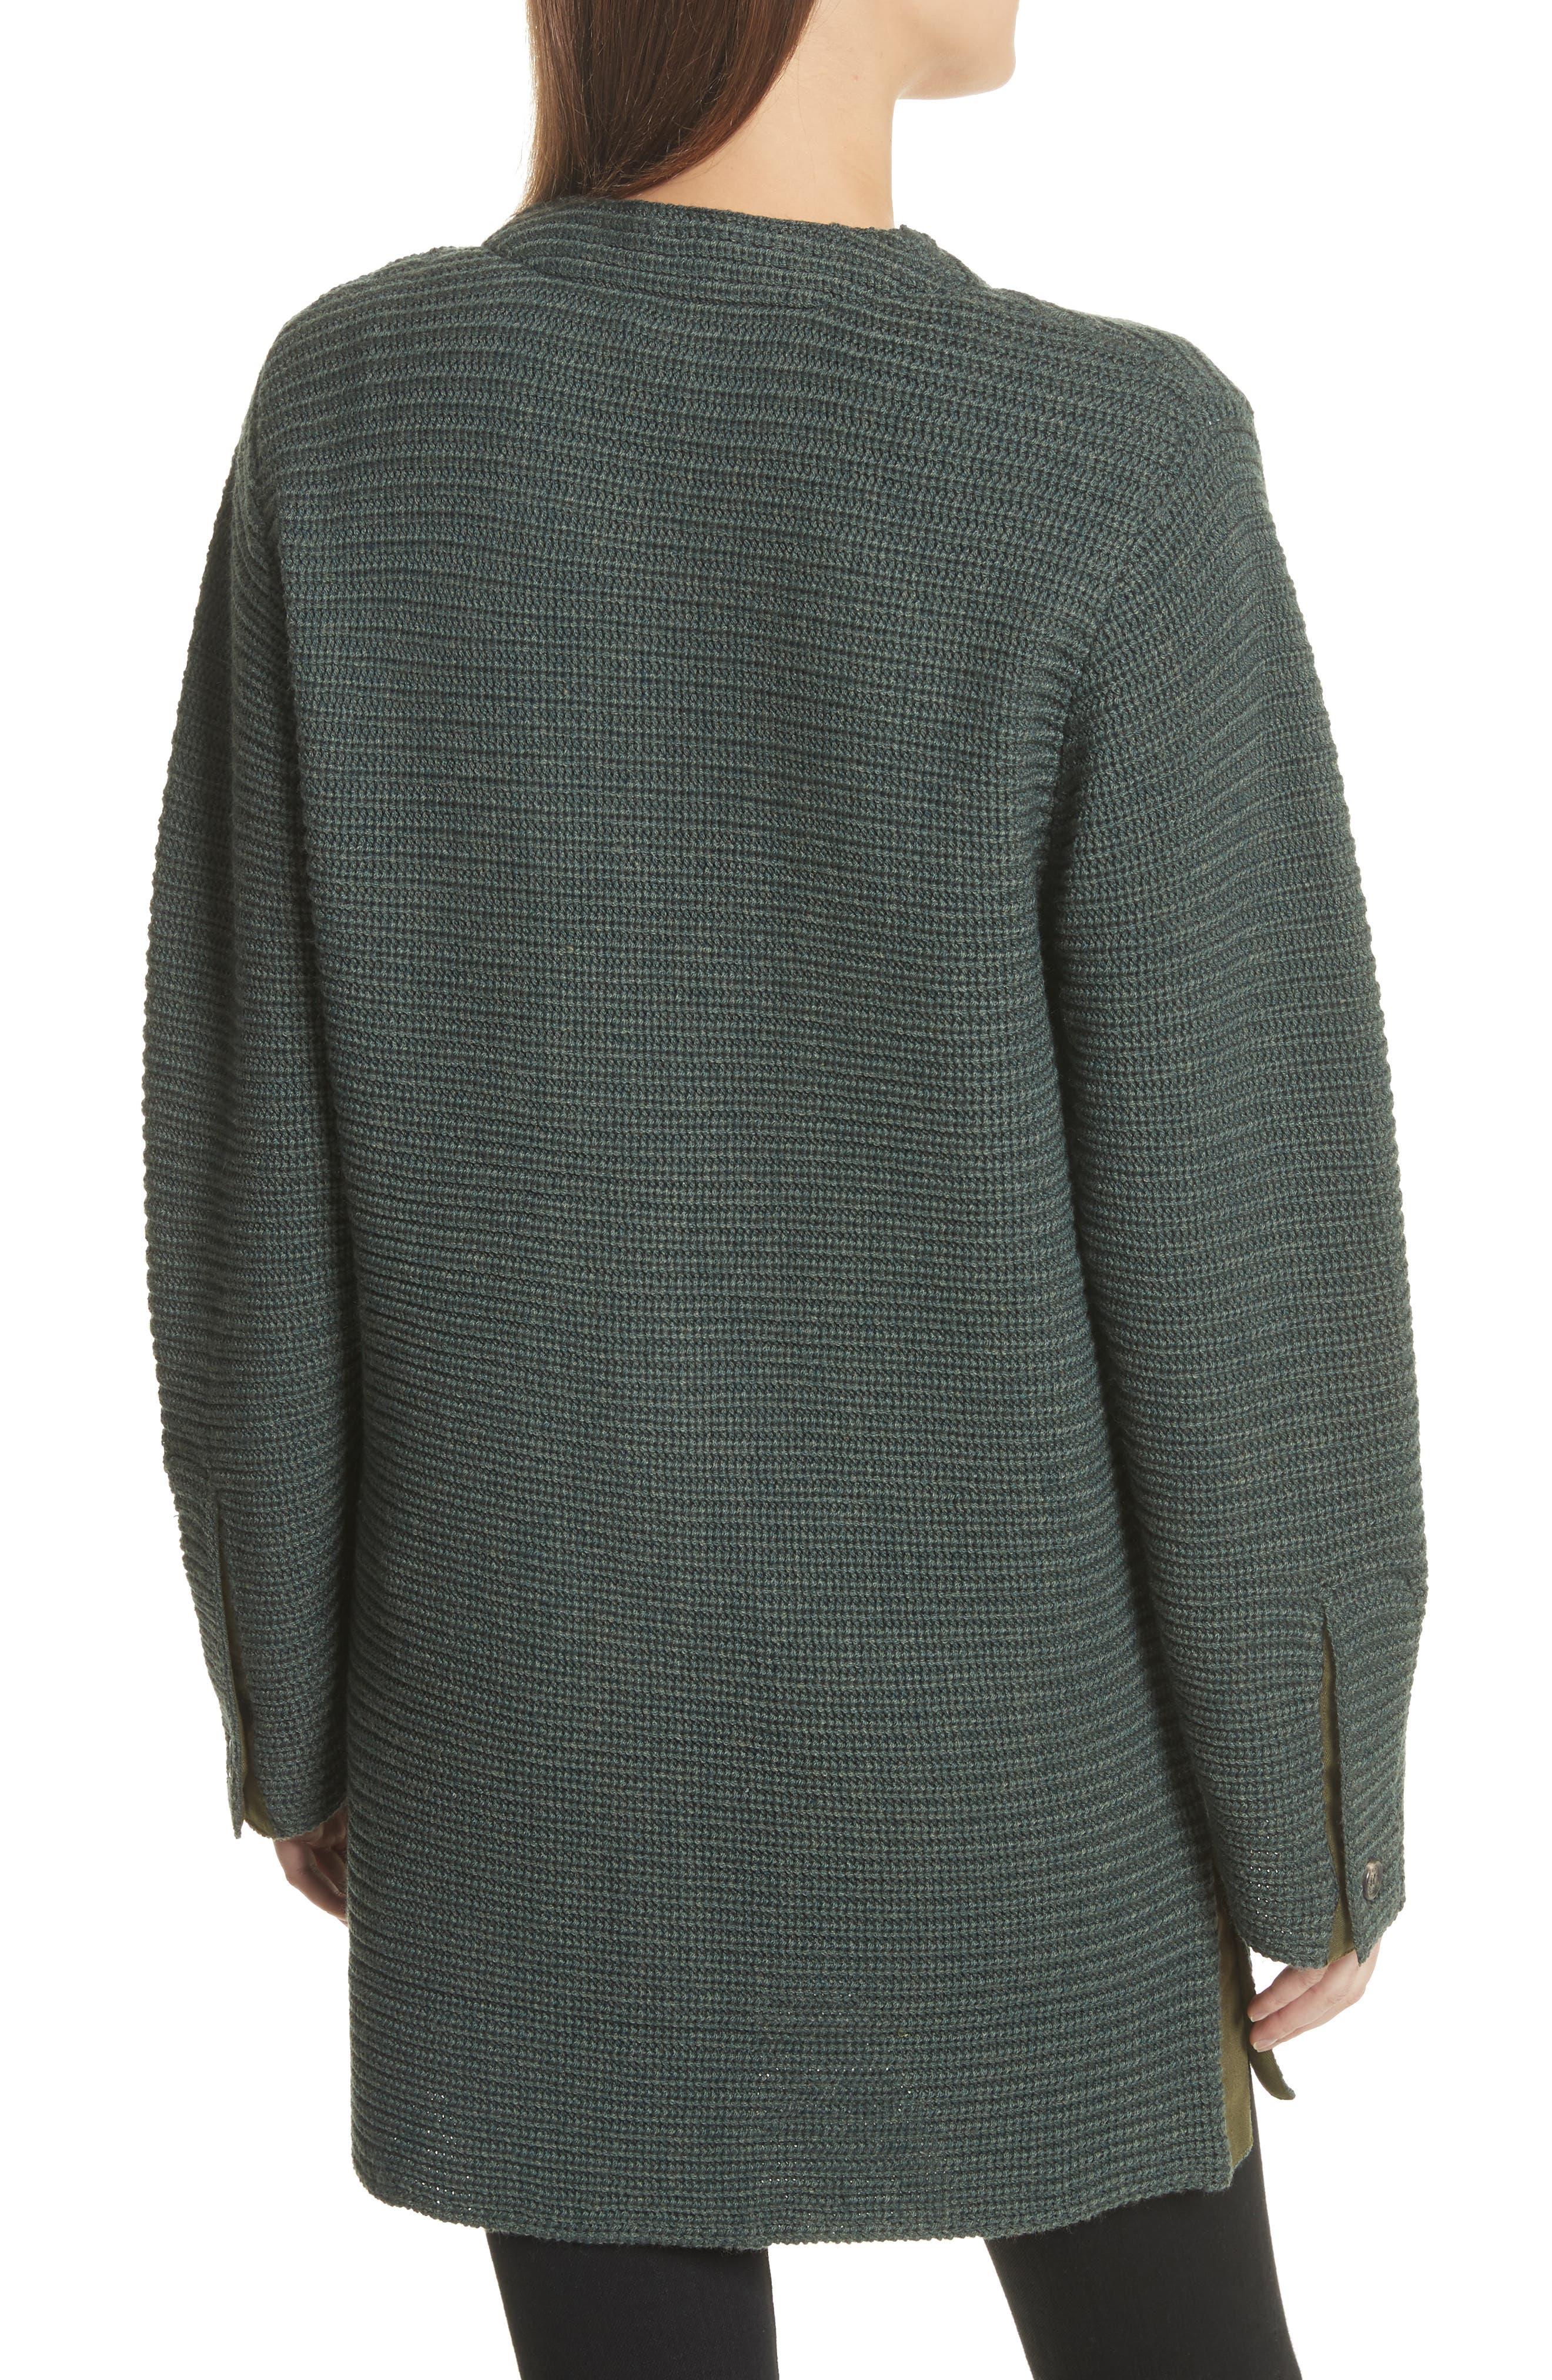 Fleta Merino Wool Blend Cardigan,                             Alternate thumbnail 3, color,                             Olive